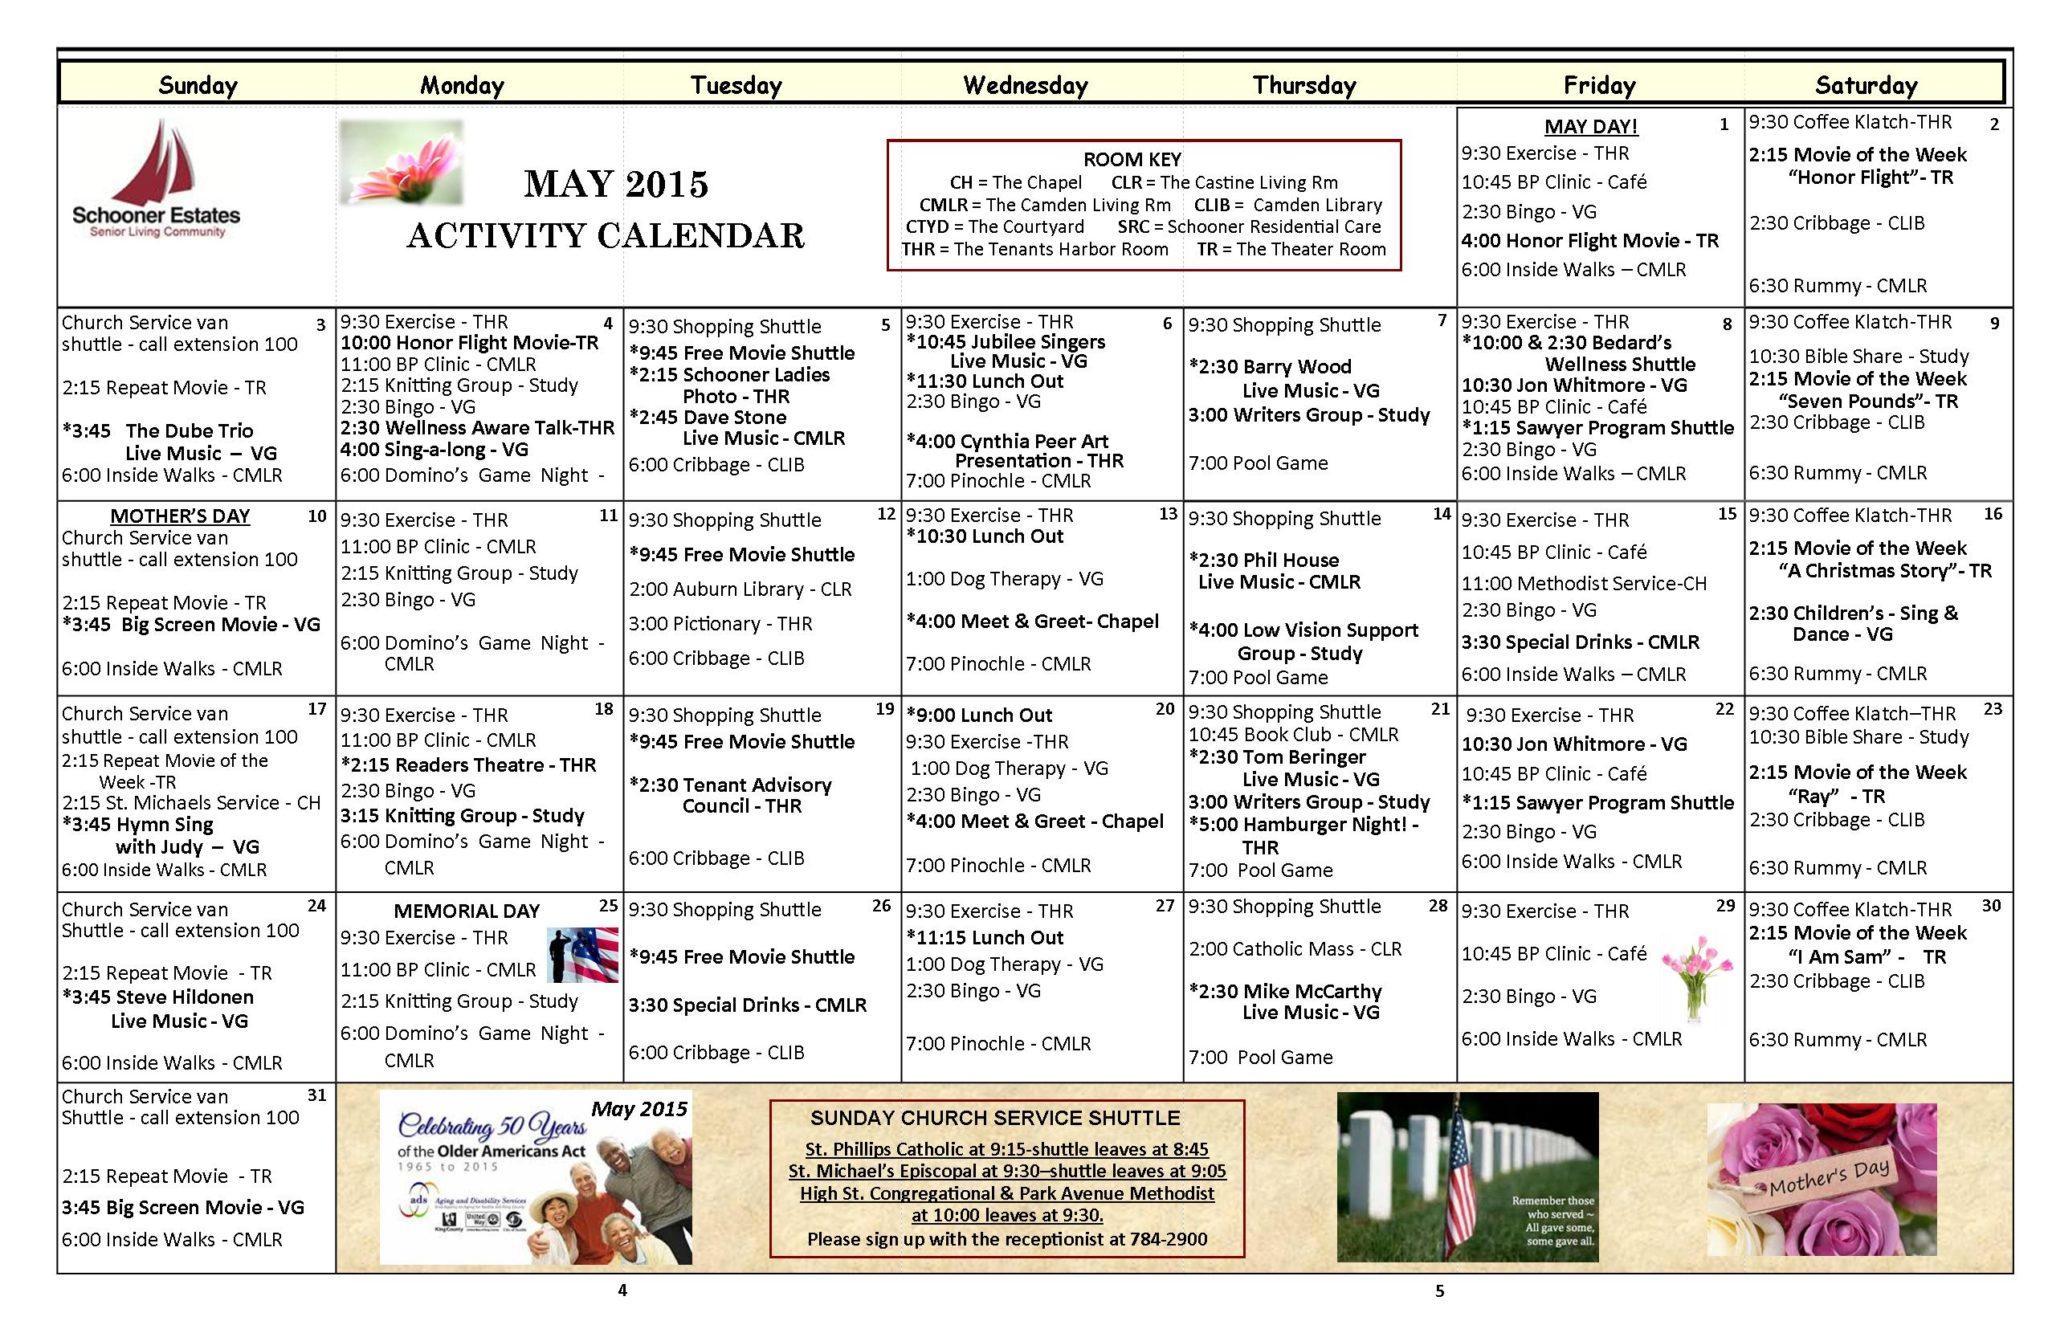 May 2015 activity calendar